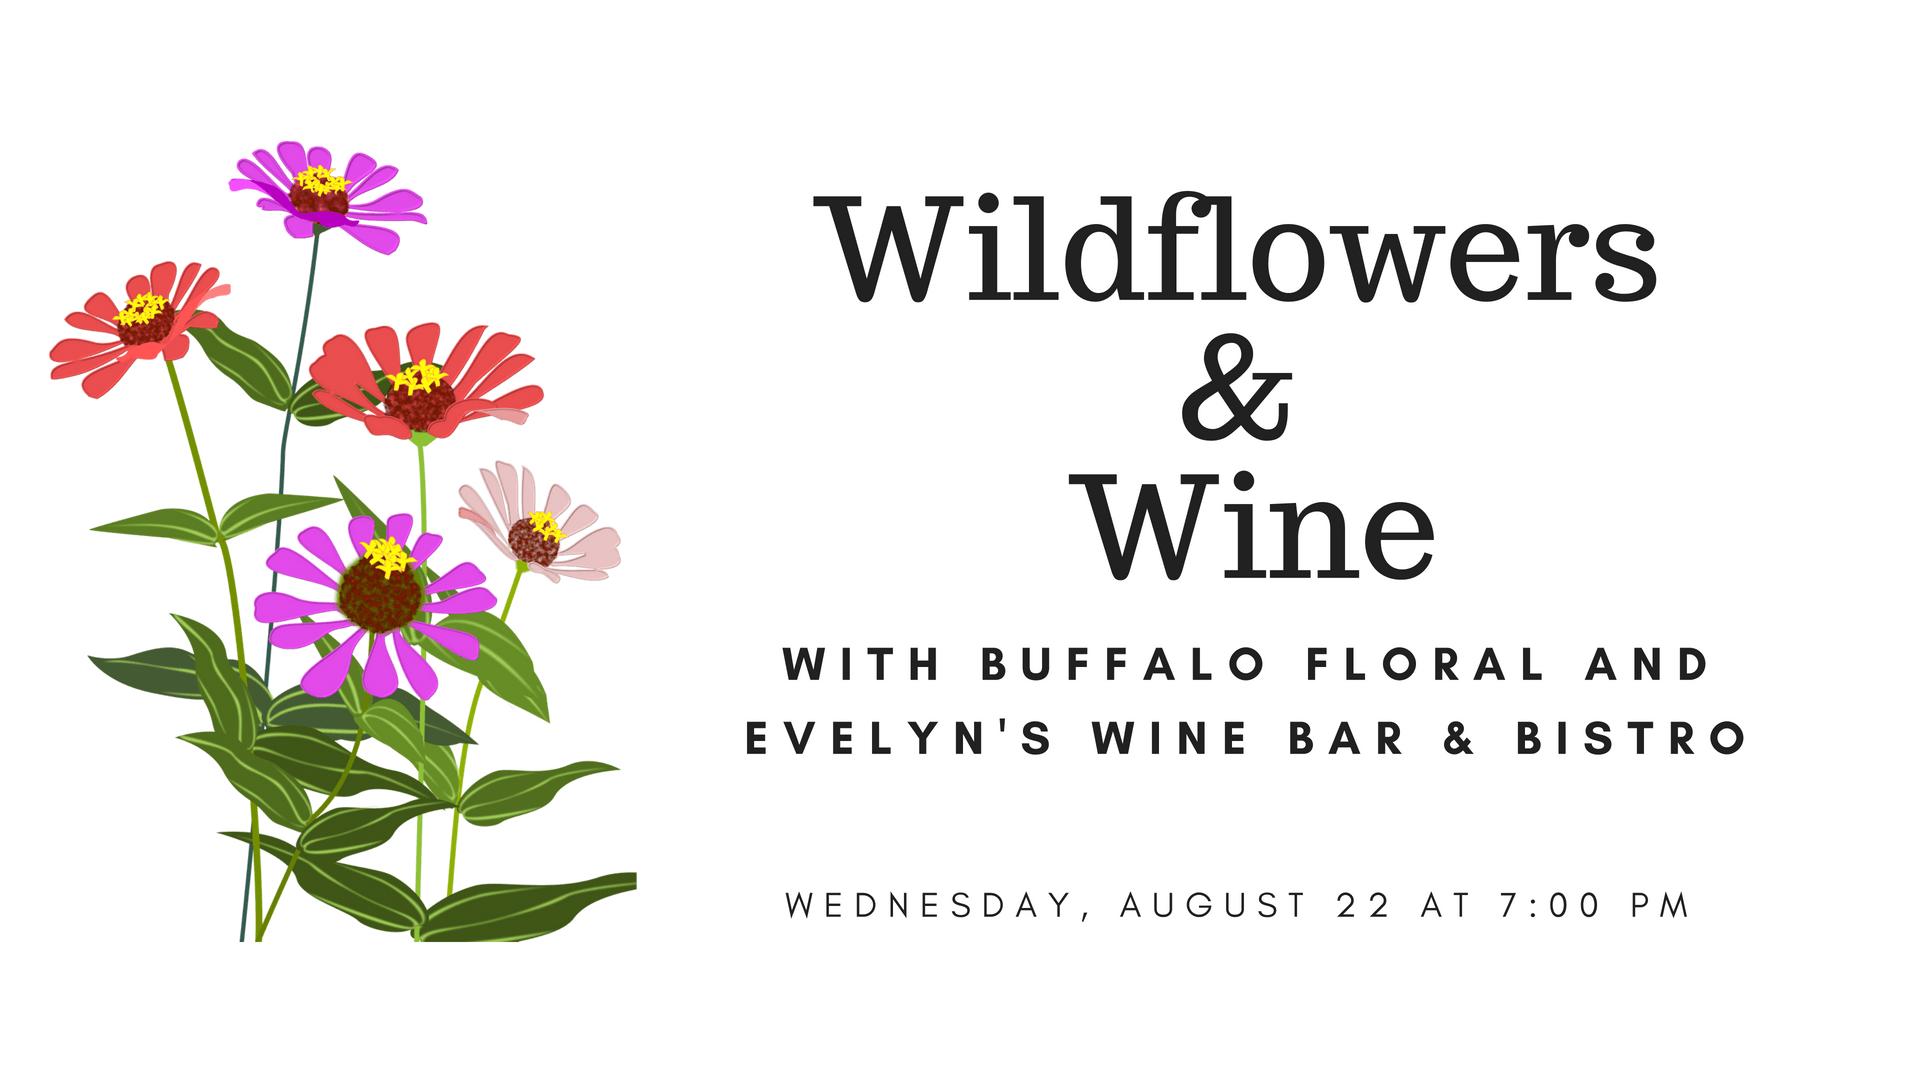 Wildflowers and Wine